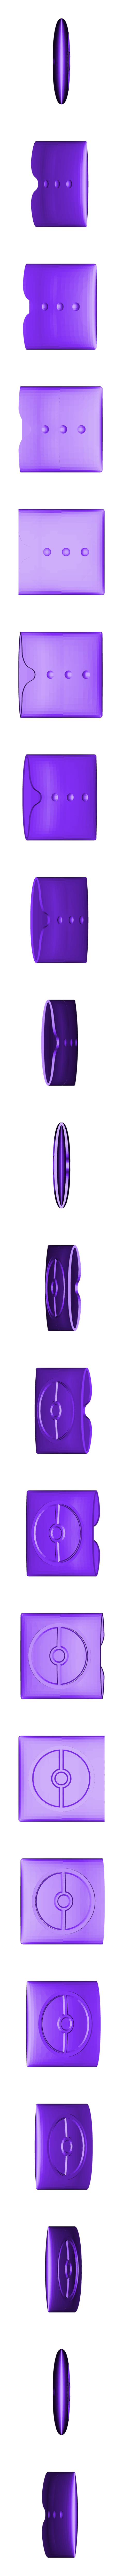 Pokeball condom pocket.stl Download STL file Pokeball condom pocket • 3D print model, Jtachan